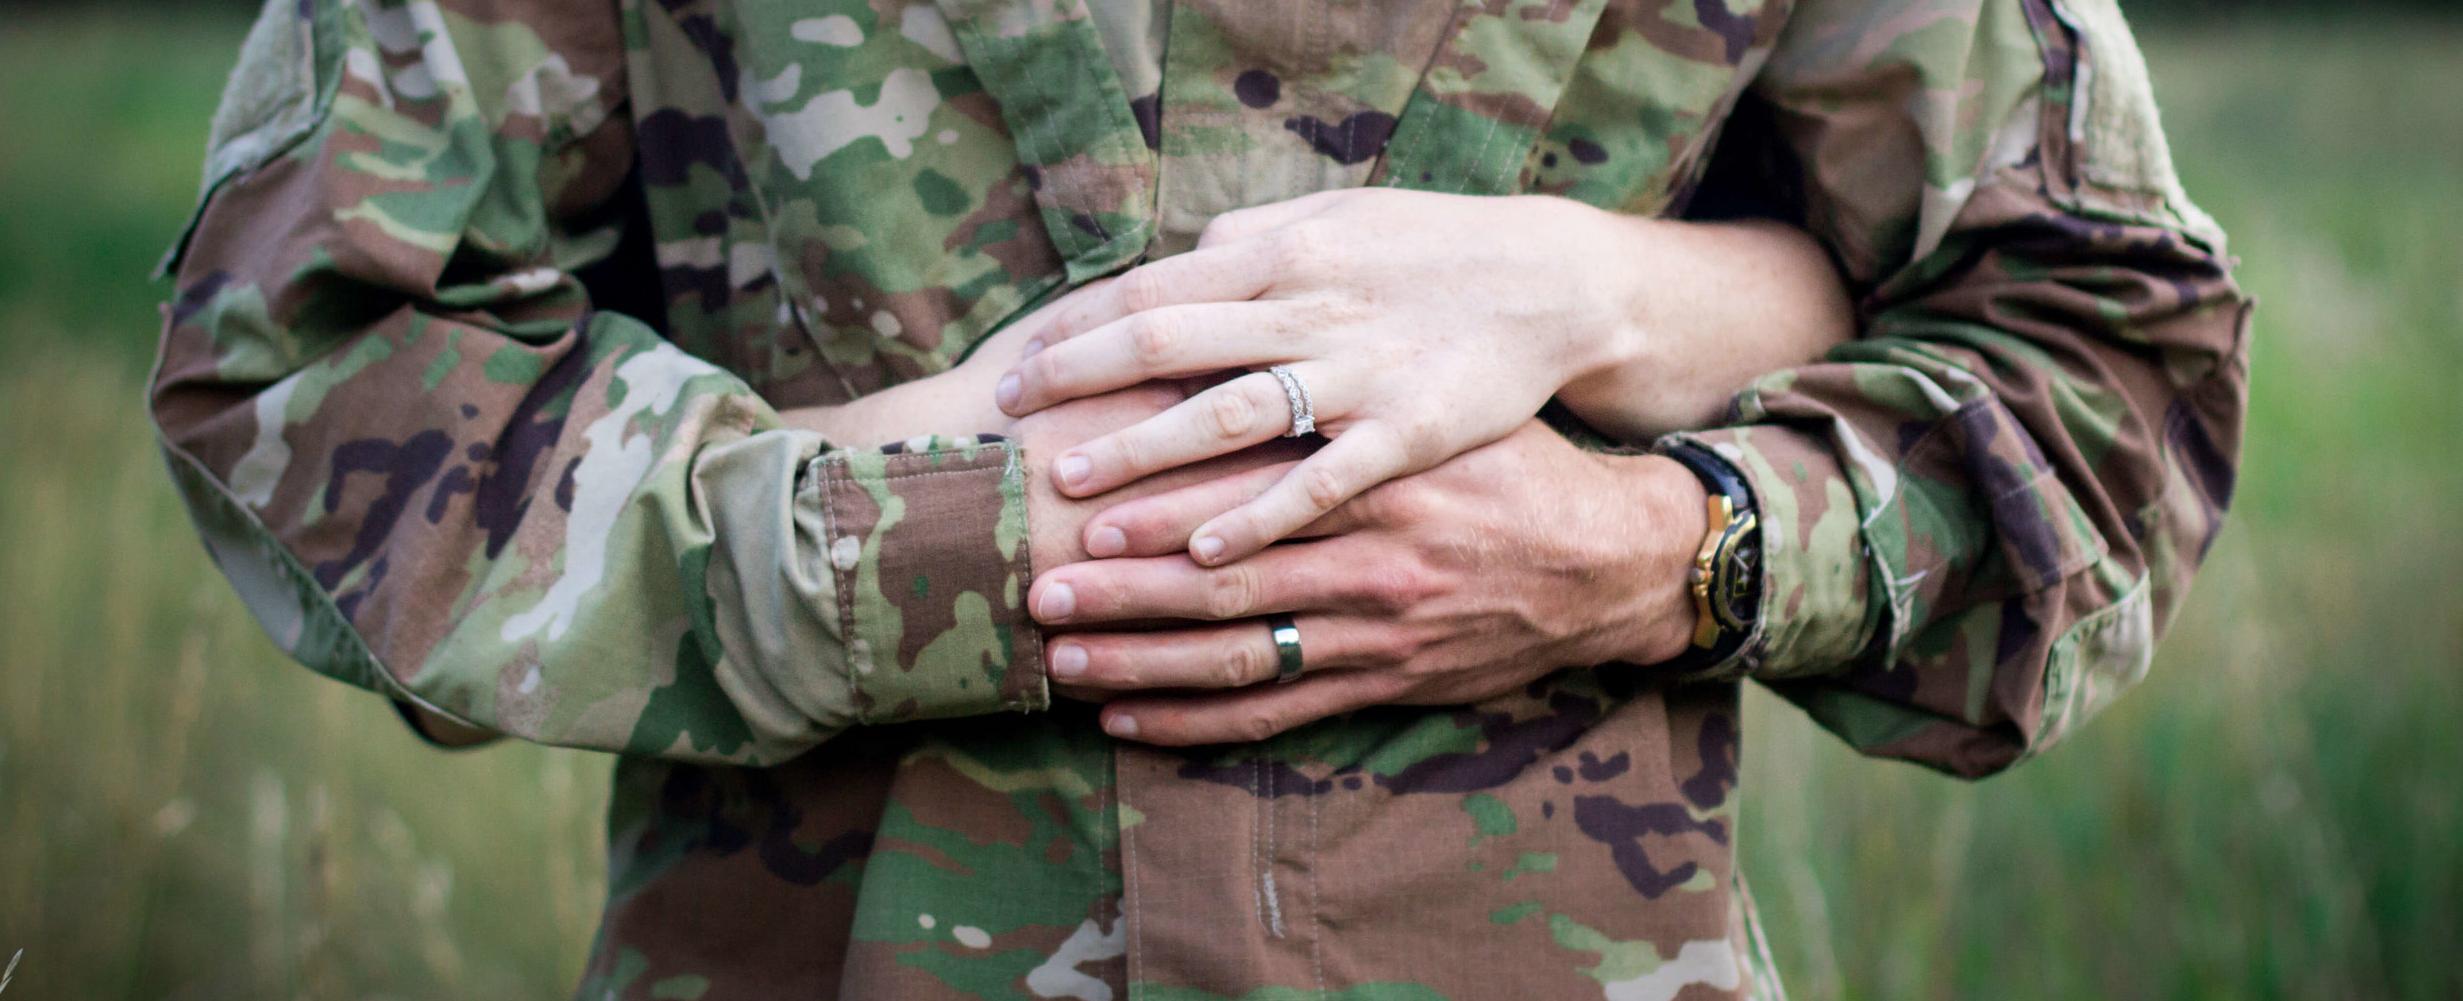 MARRIAGE <em>MANAGEMENT</em>, not counseling.